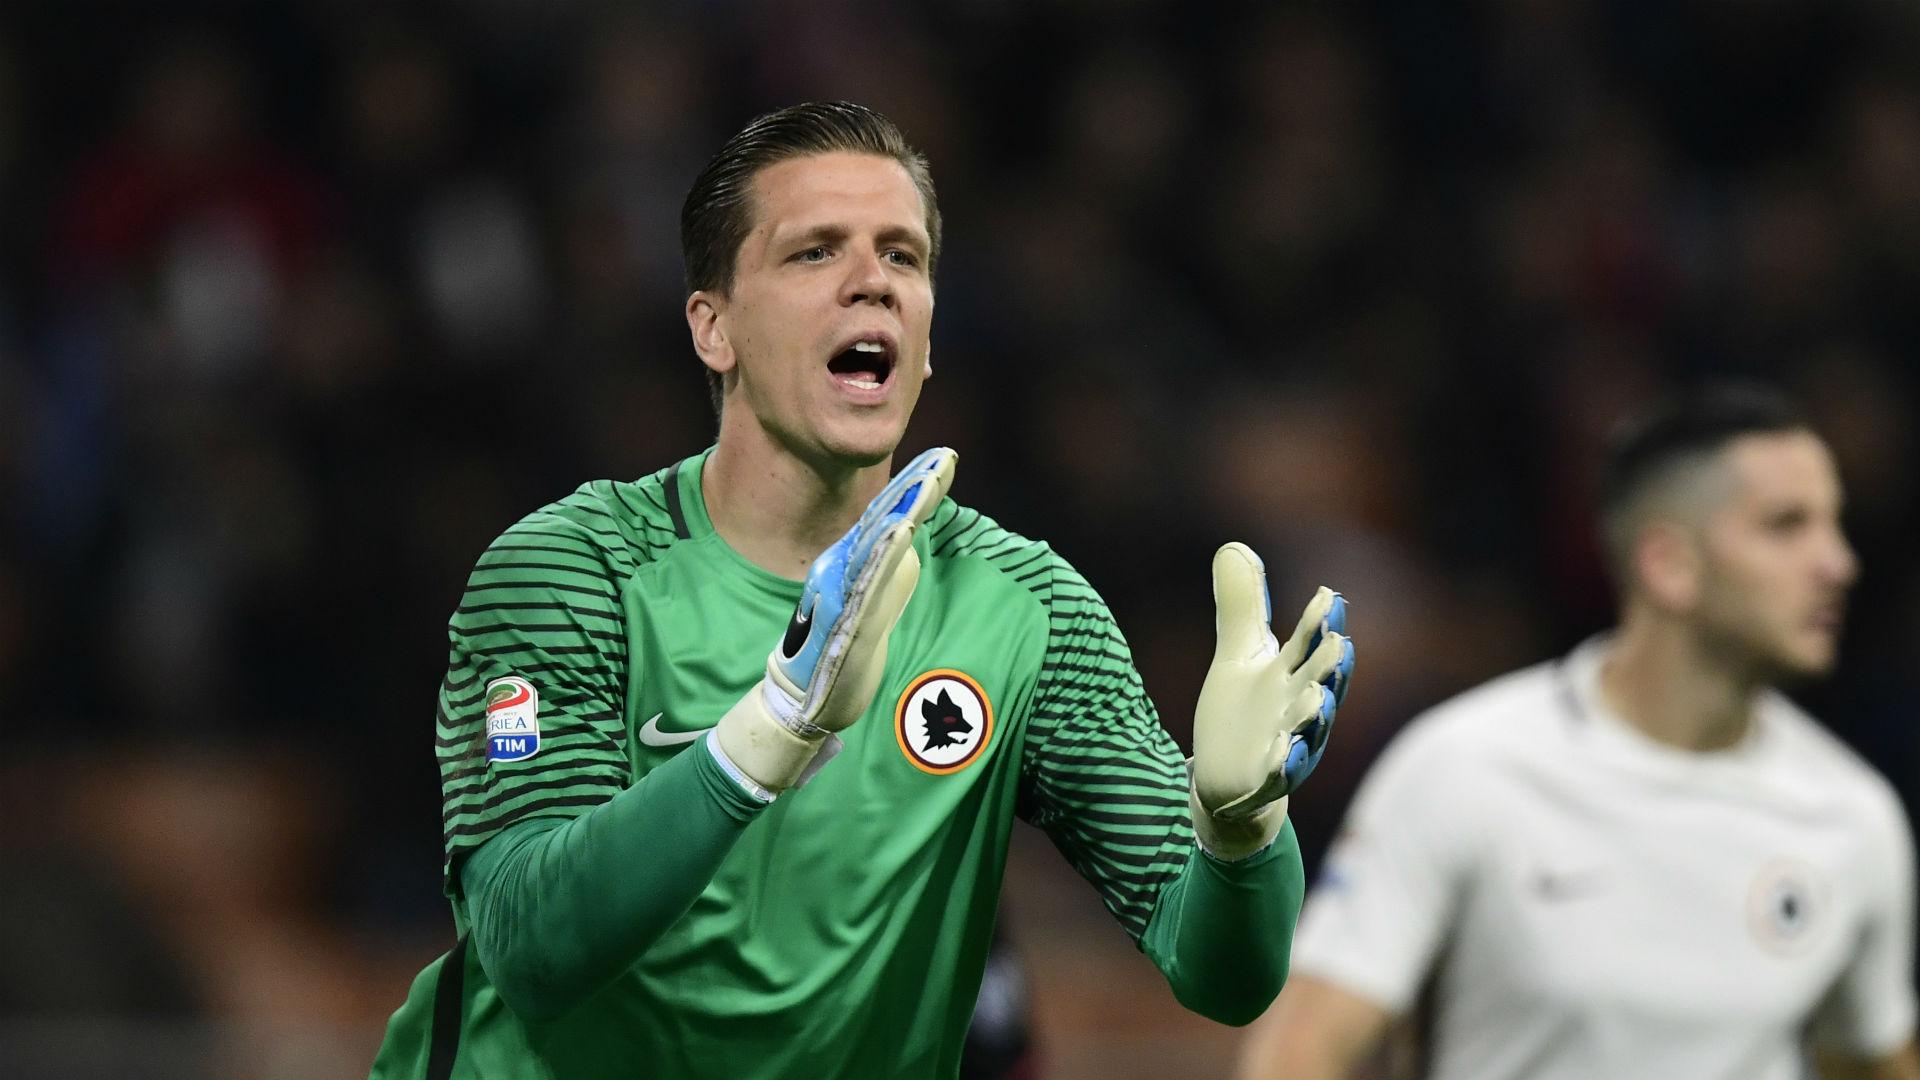 Calciomercato Juventus/ News, a breve ufficiali Szczesny e De Sciglio (Ultime notizie)